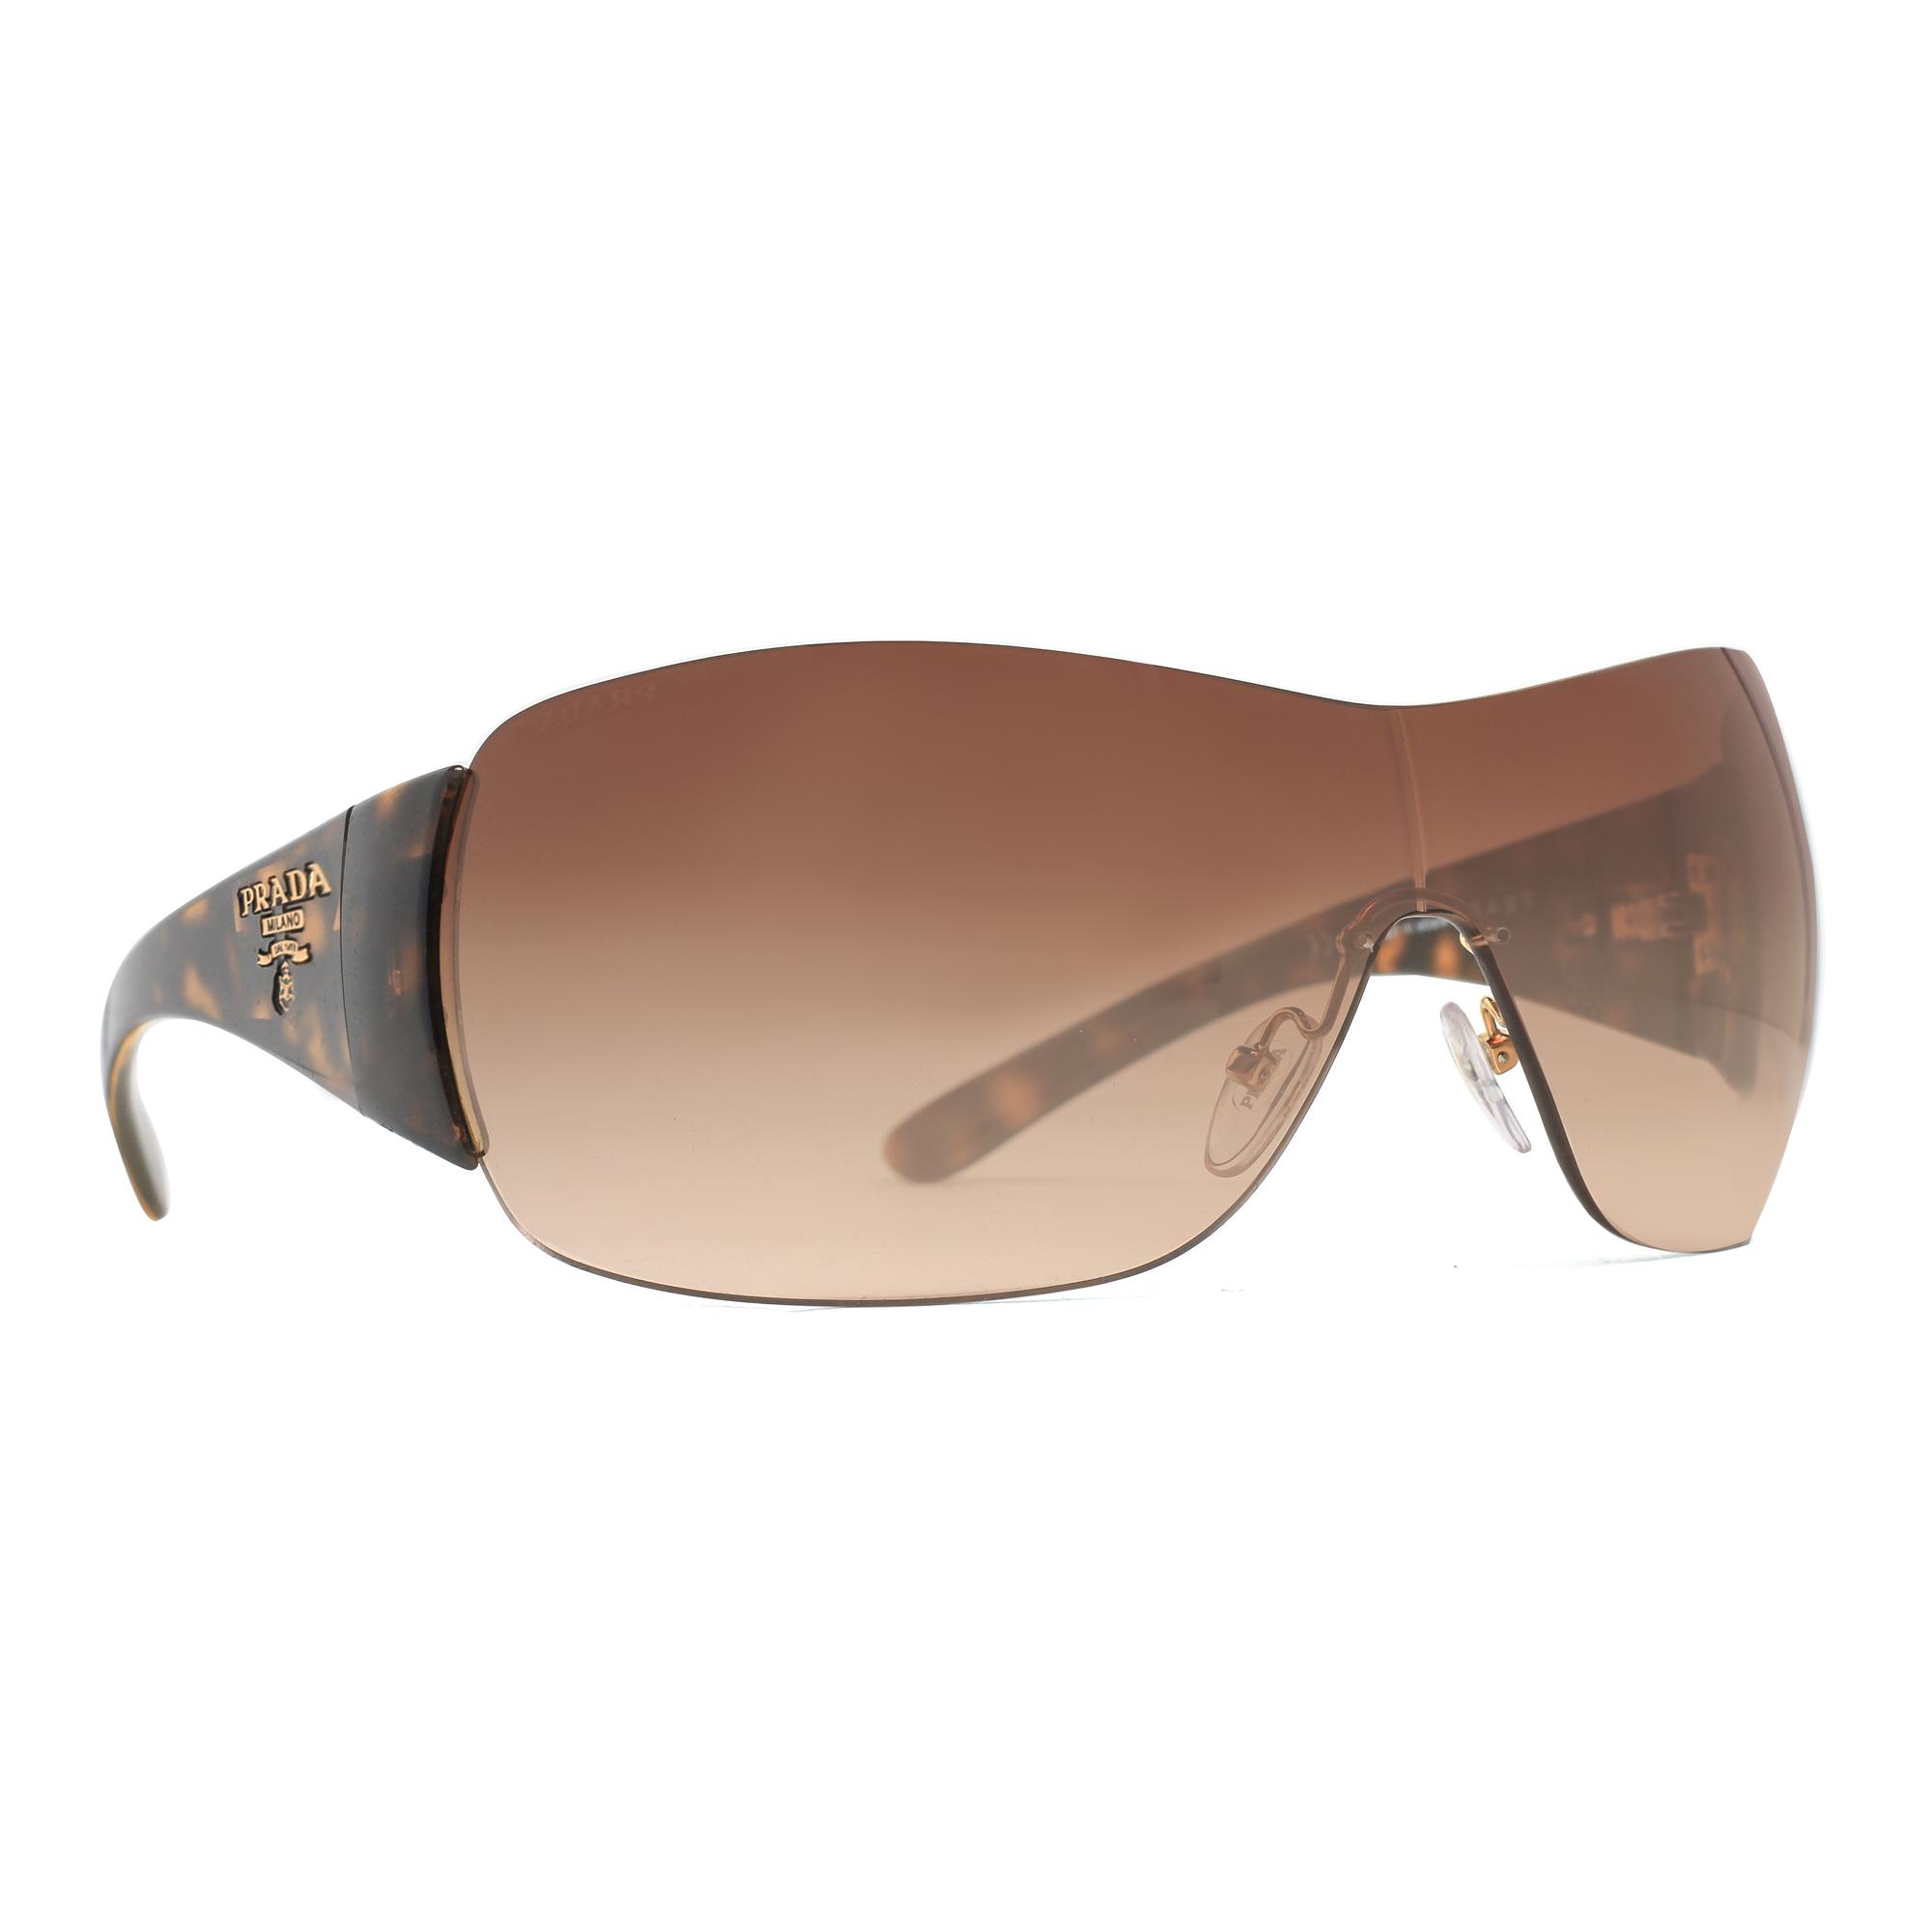 8a4f658003 Prada Milano Sunglasses Spr16l